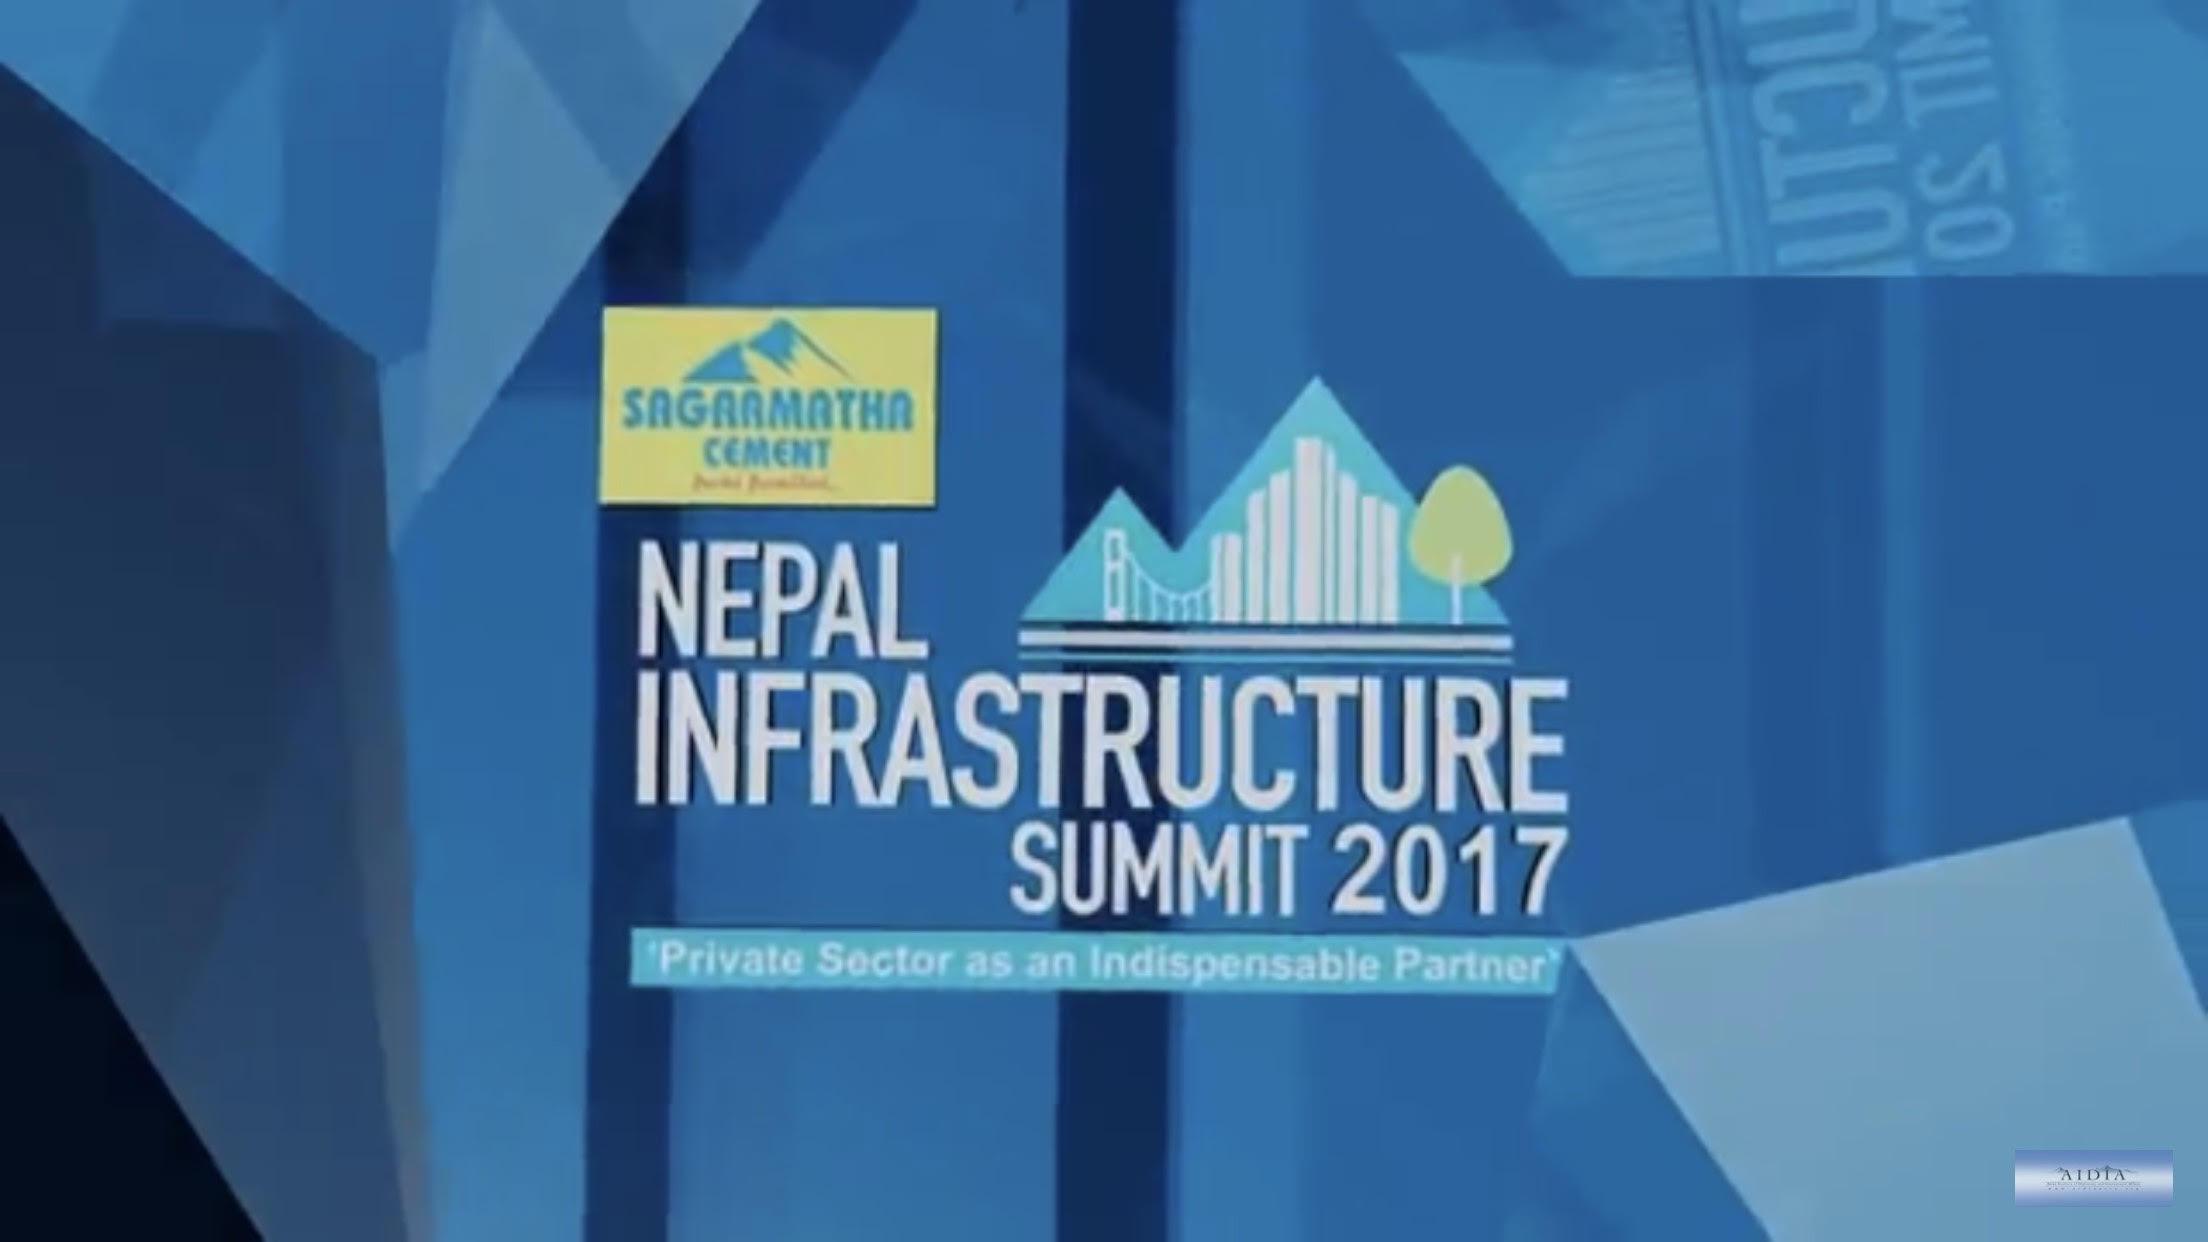 Nepal Infrastructure Summit (NIS) 2017 Report